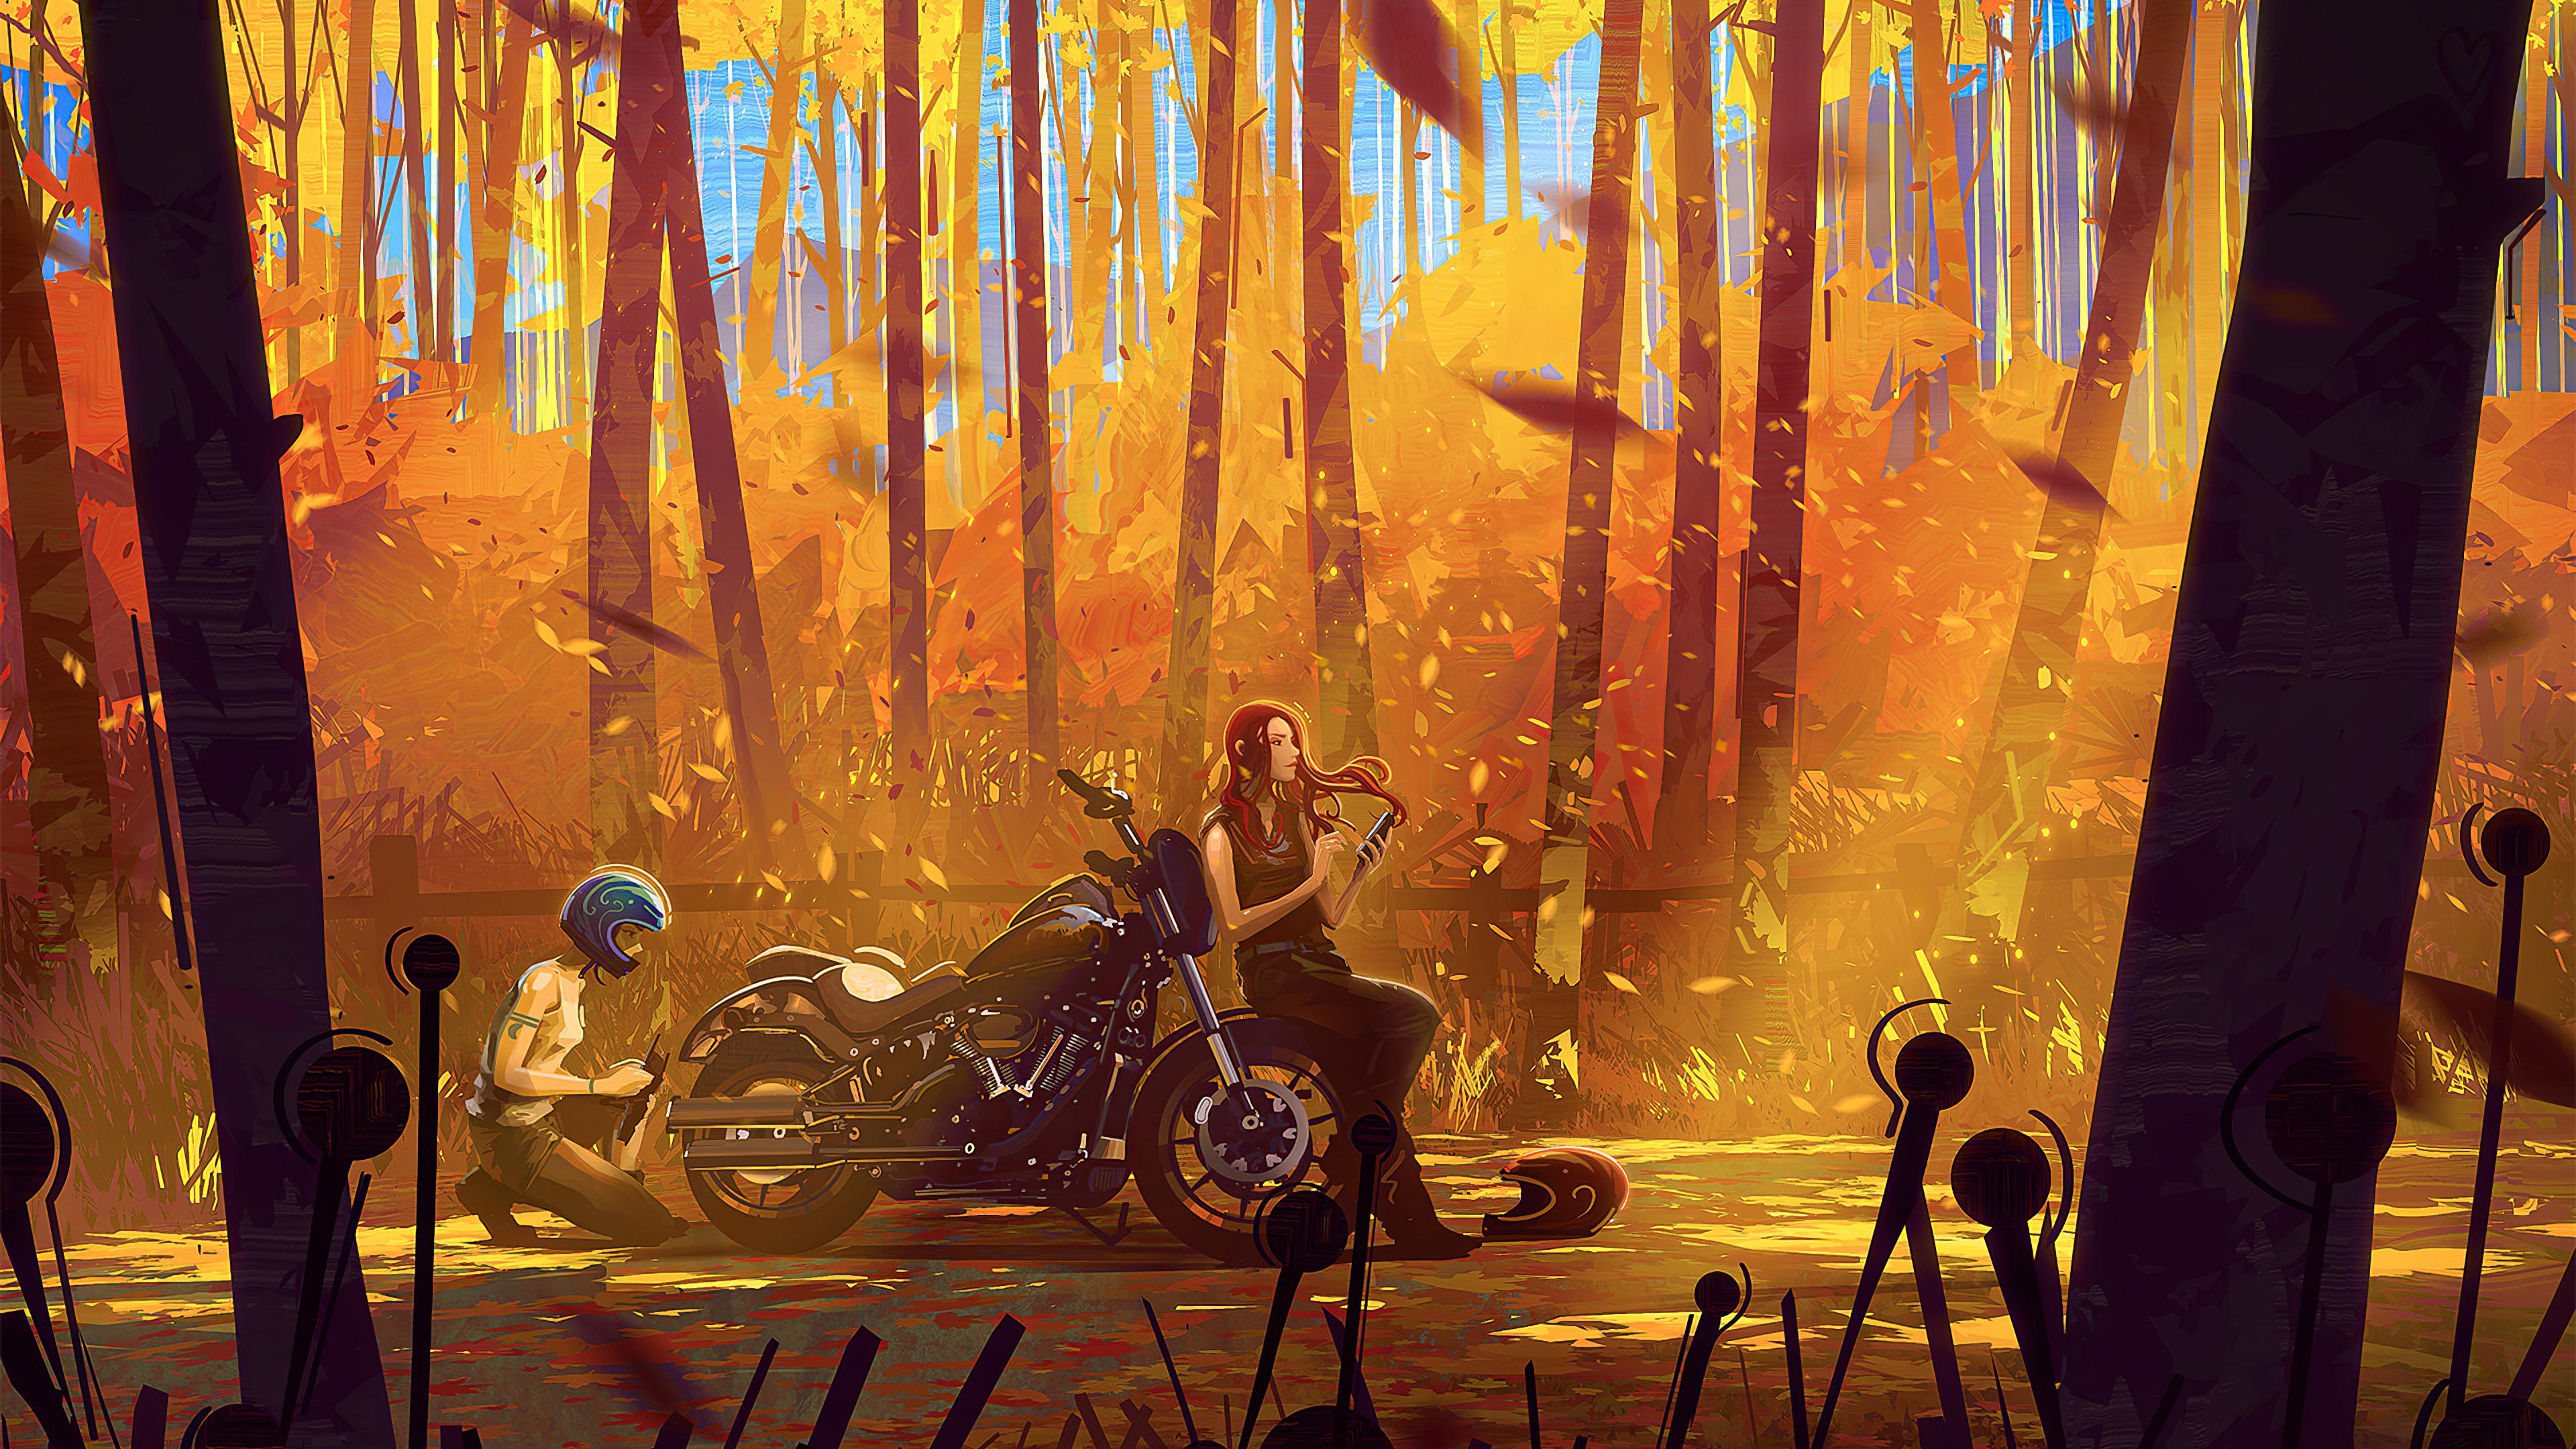 a-beautiful-autumn-biker-breakdown-4k-f3.jpg